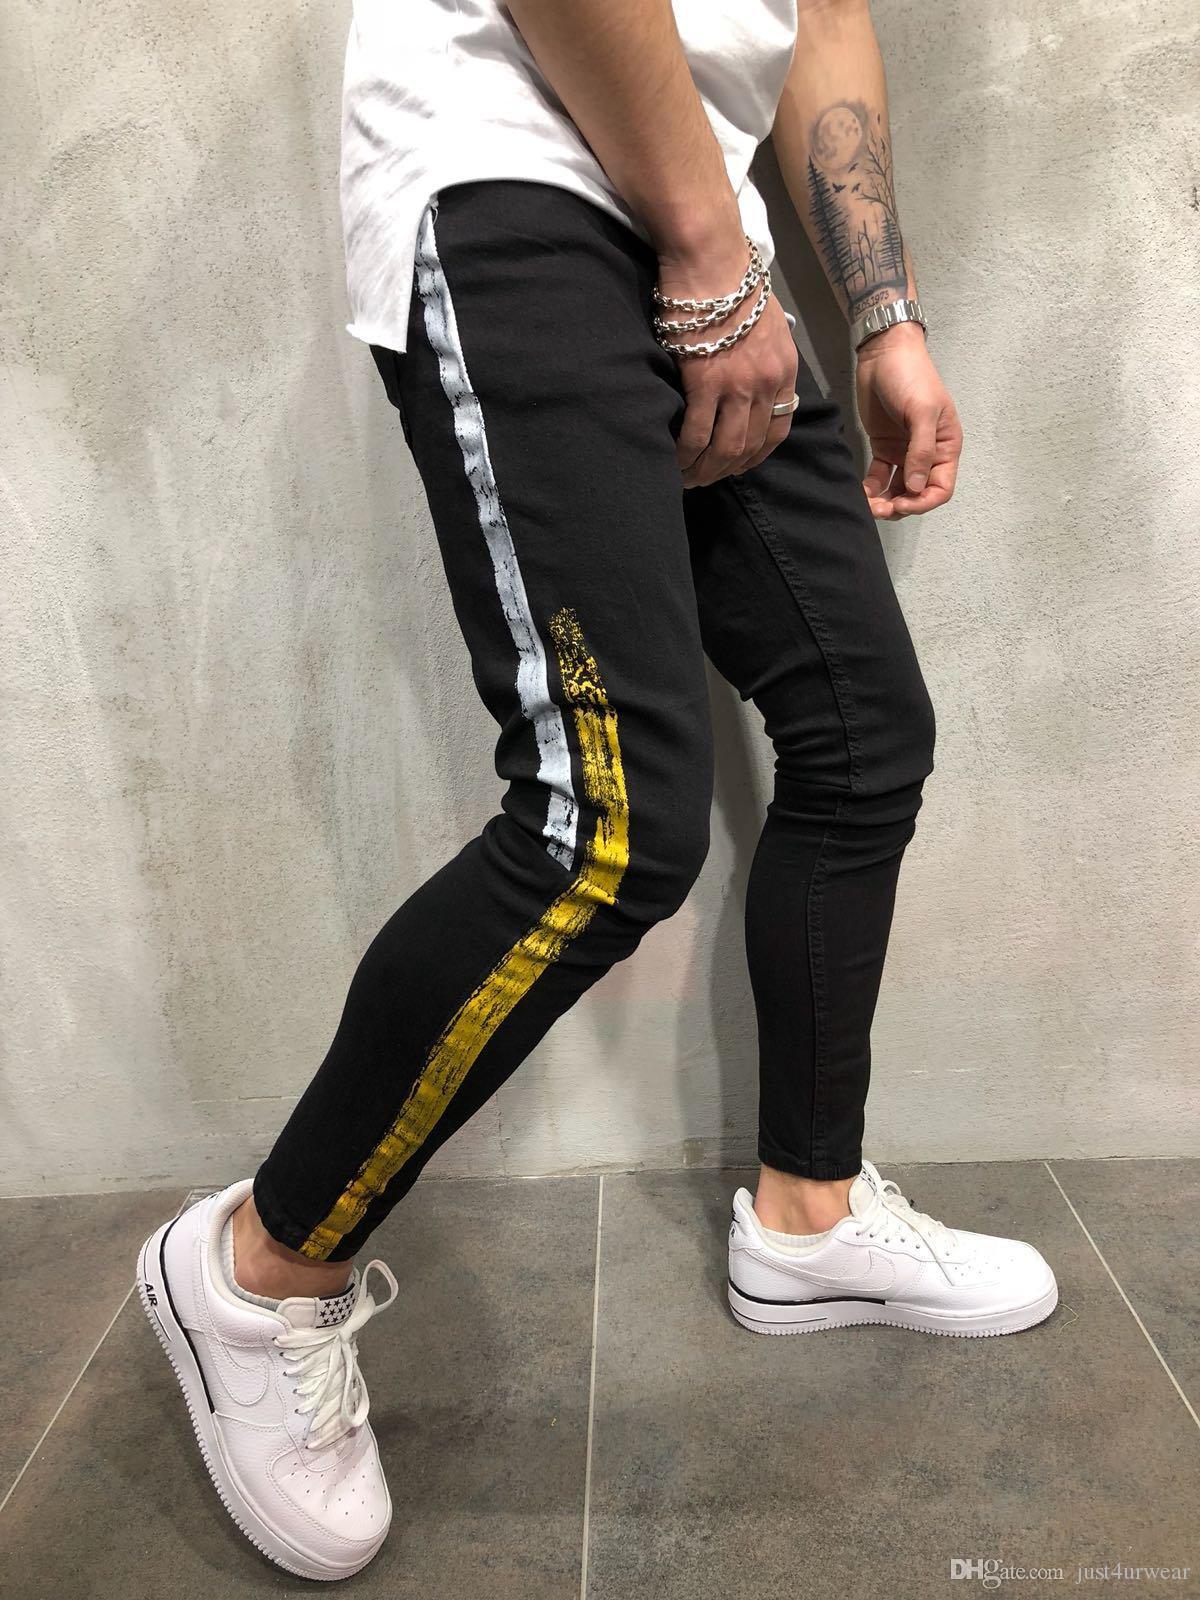 Mens Fashion High Street Slim Jeans Pantalons Pantalons Crayon Homme Side rayé design Washed Jeans Hommes Hip Hop Denim Jeans Pantalons